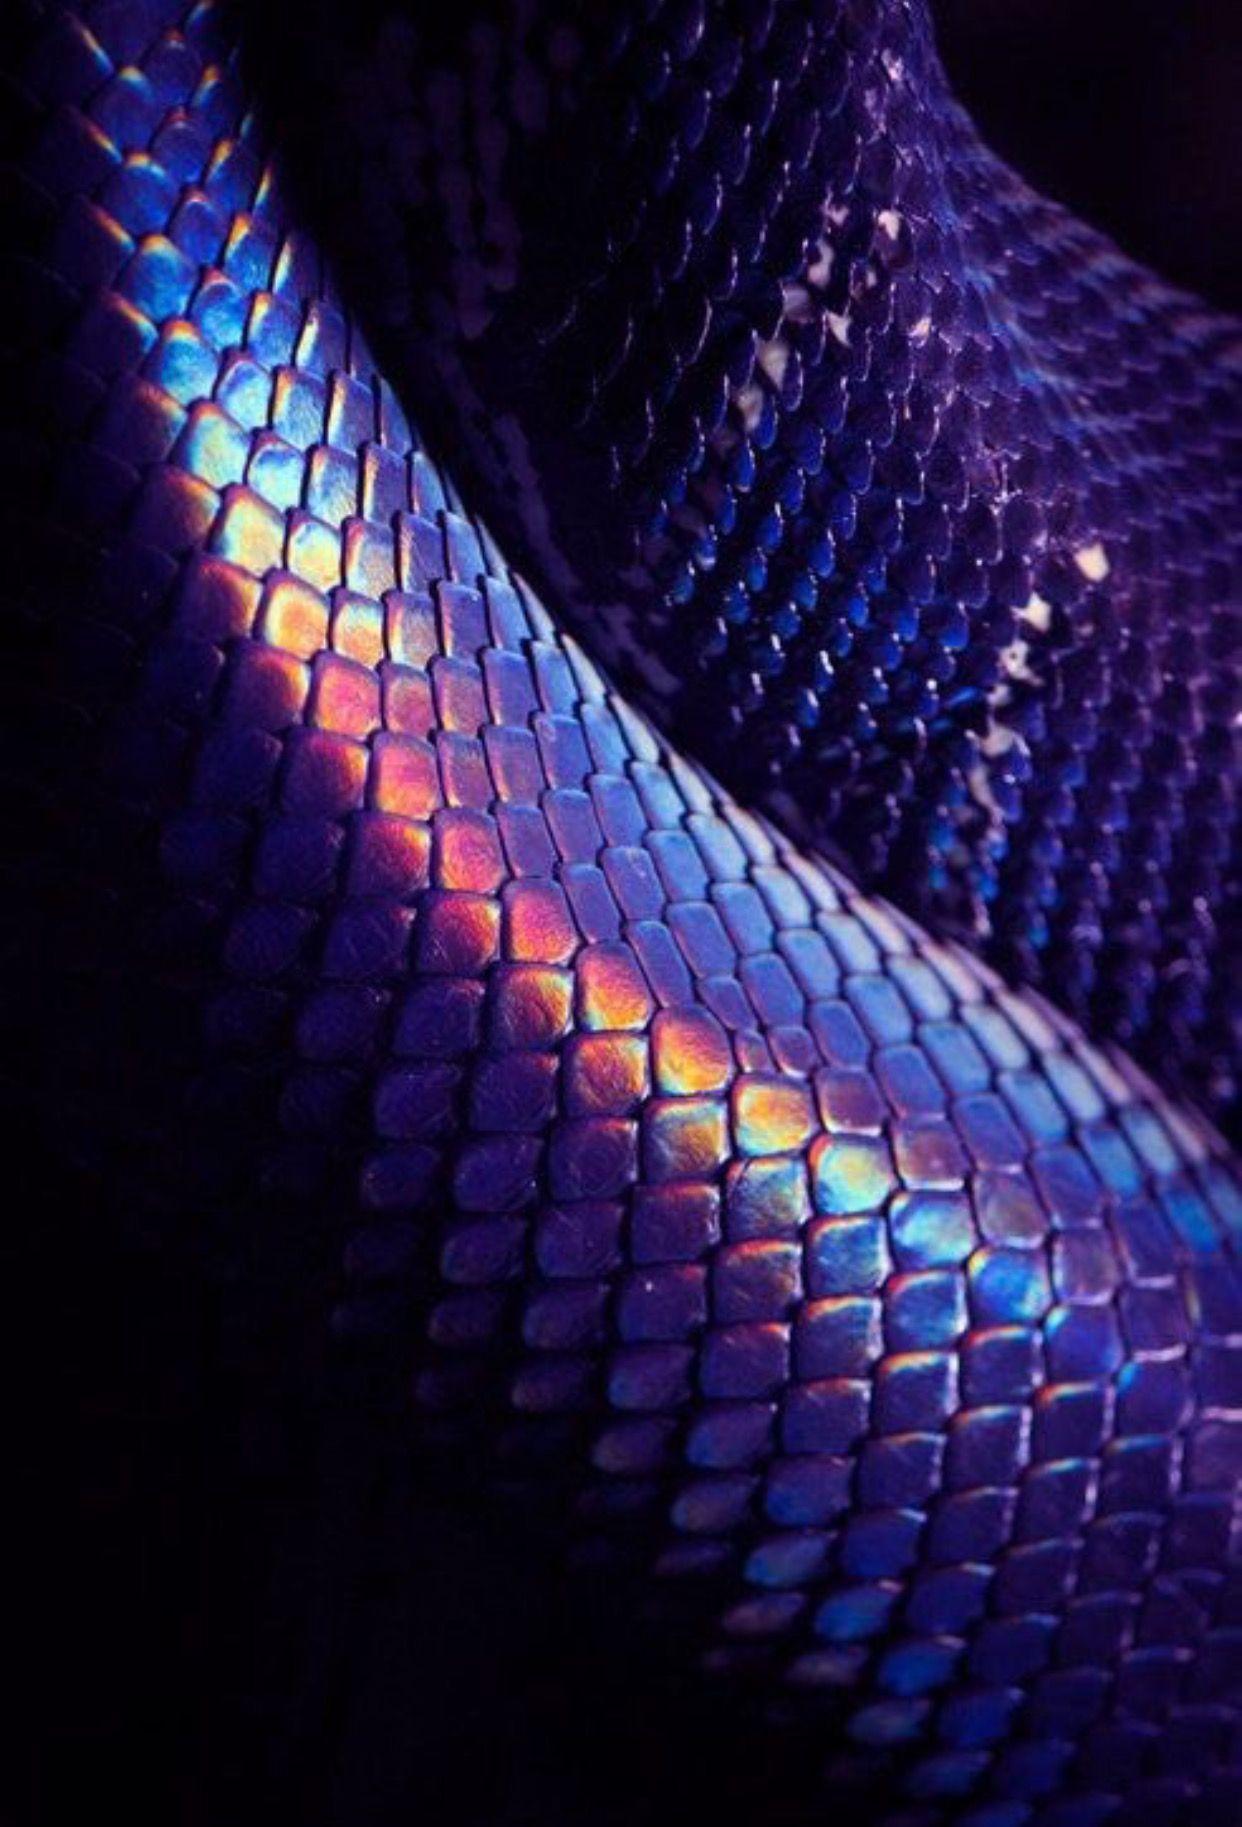 Pin By Romans Teresins On Like Purple Aesthetic Purple Snake